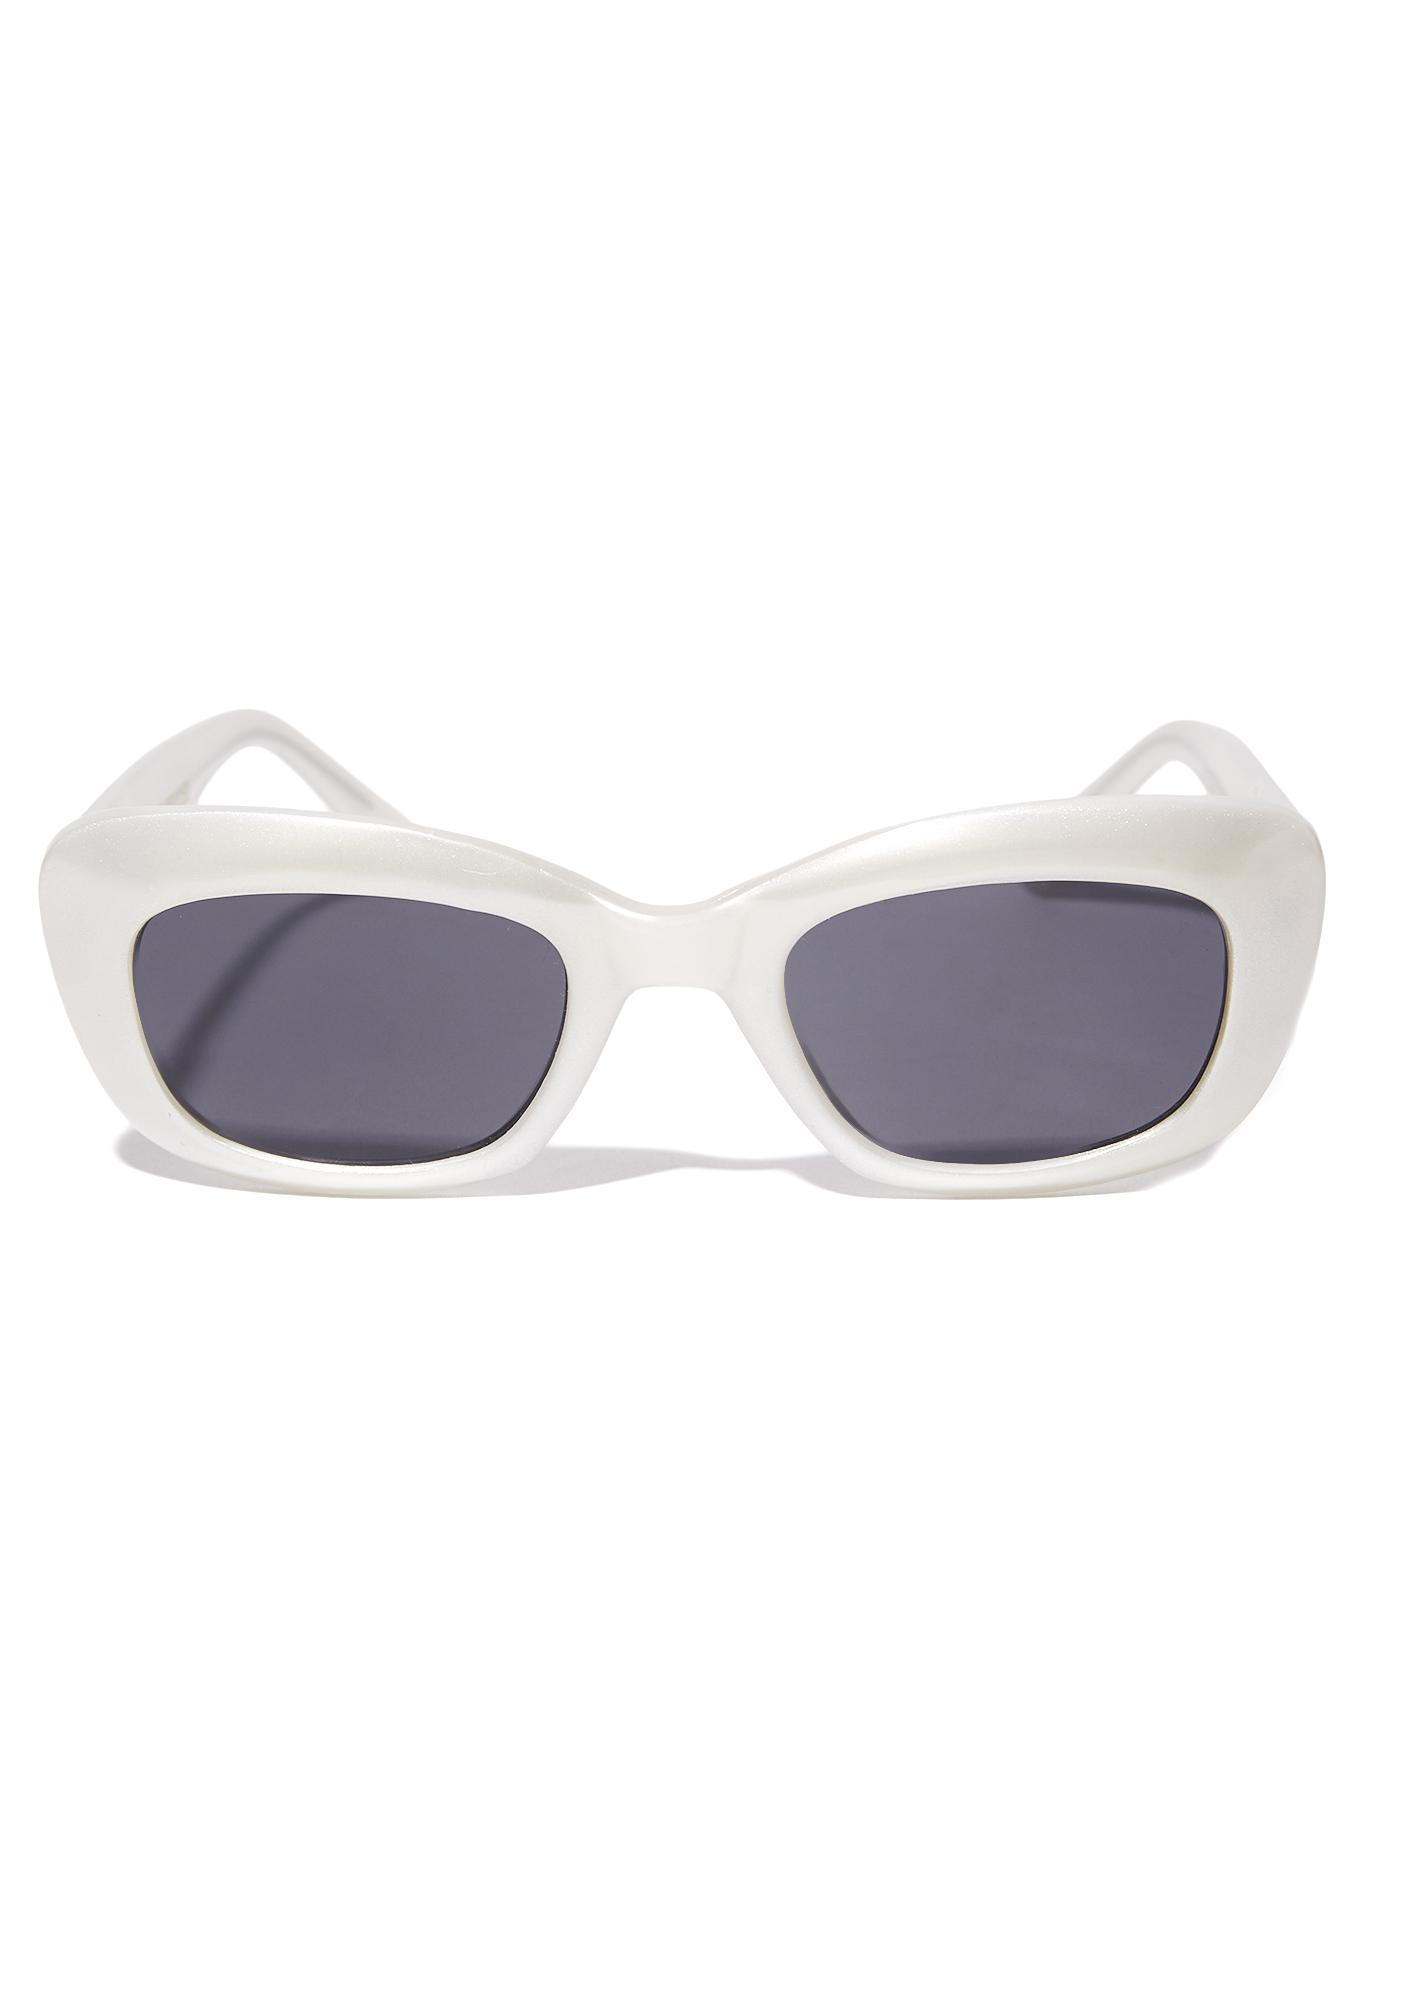 Sugar Smart Mouth Sunglasses